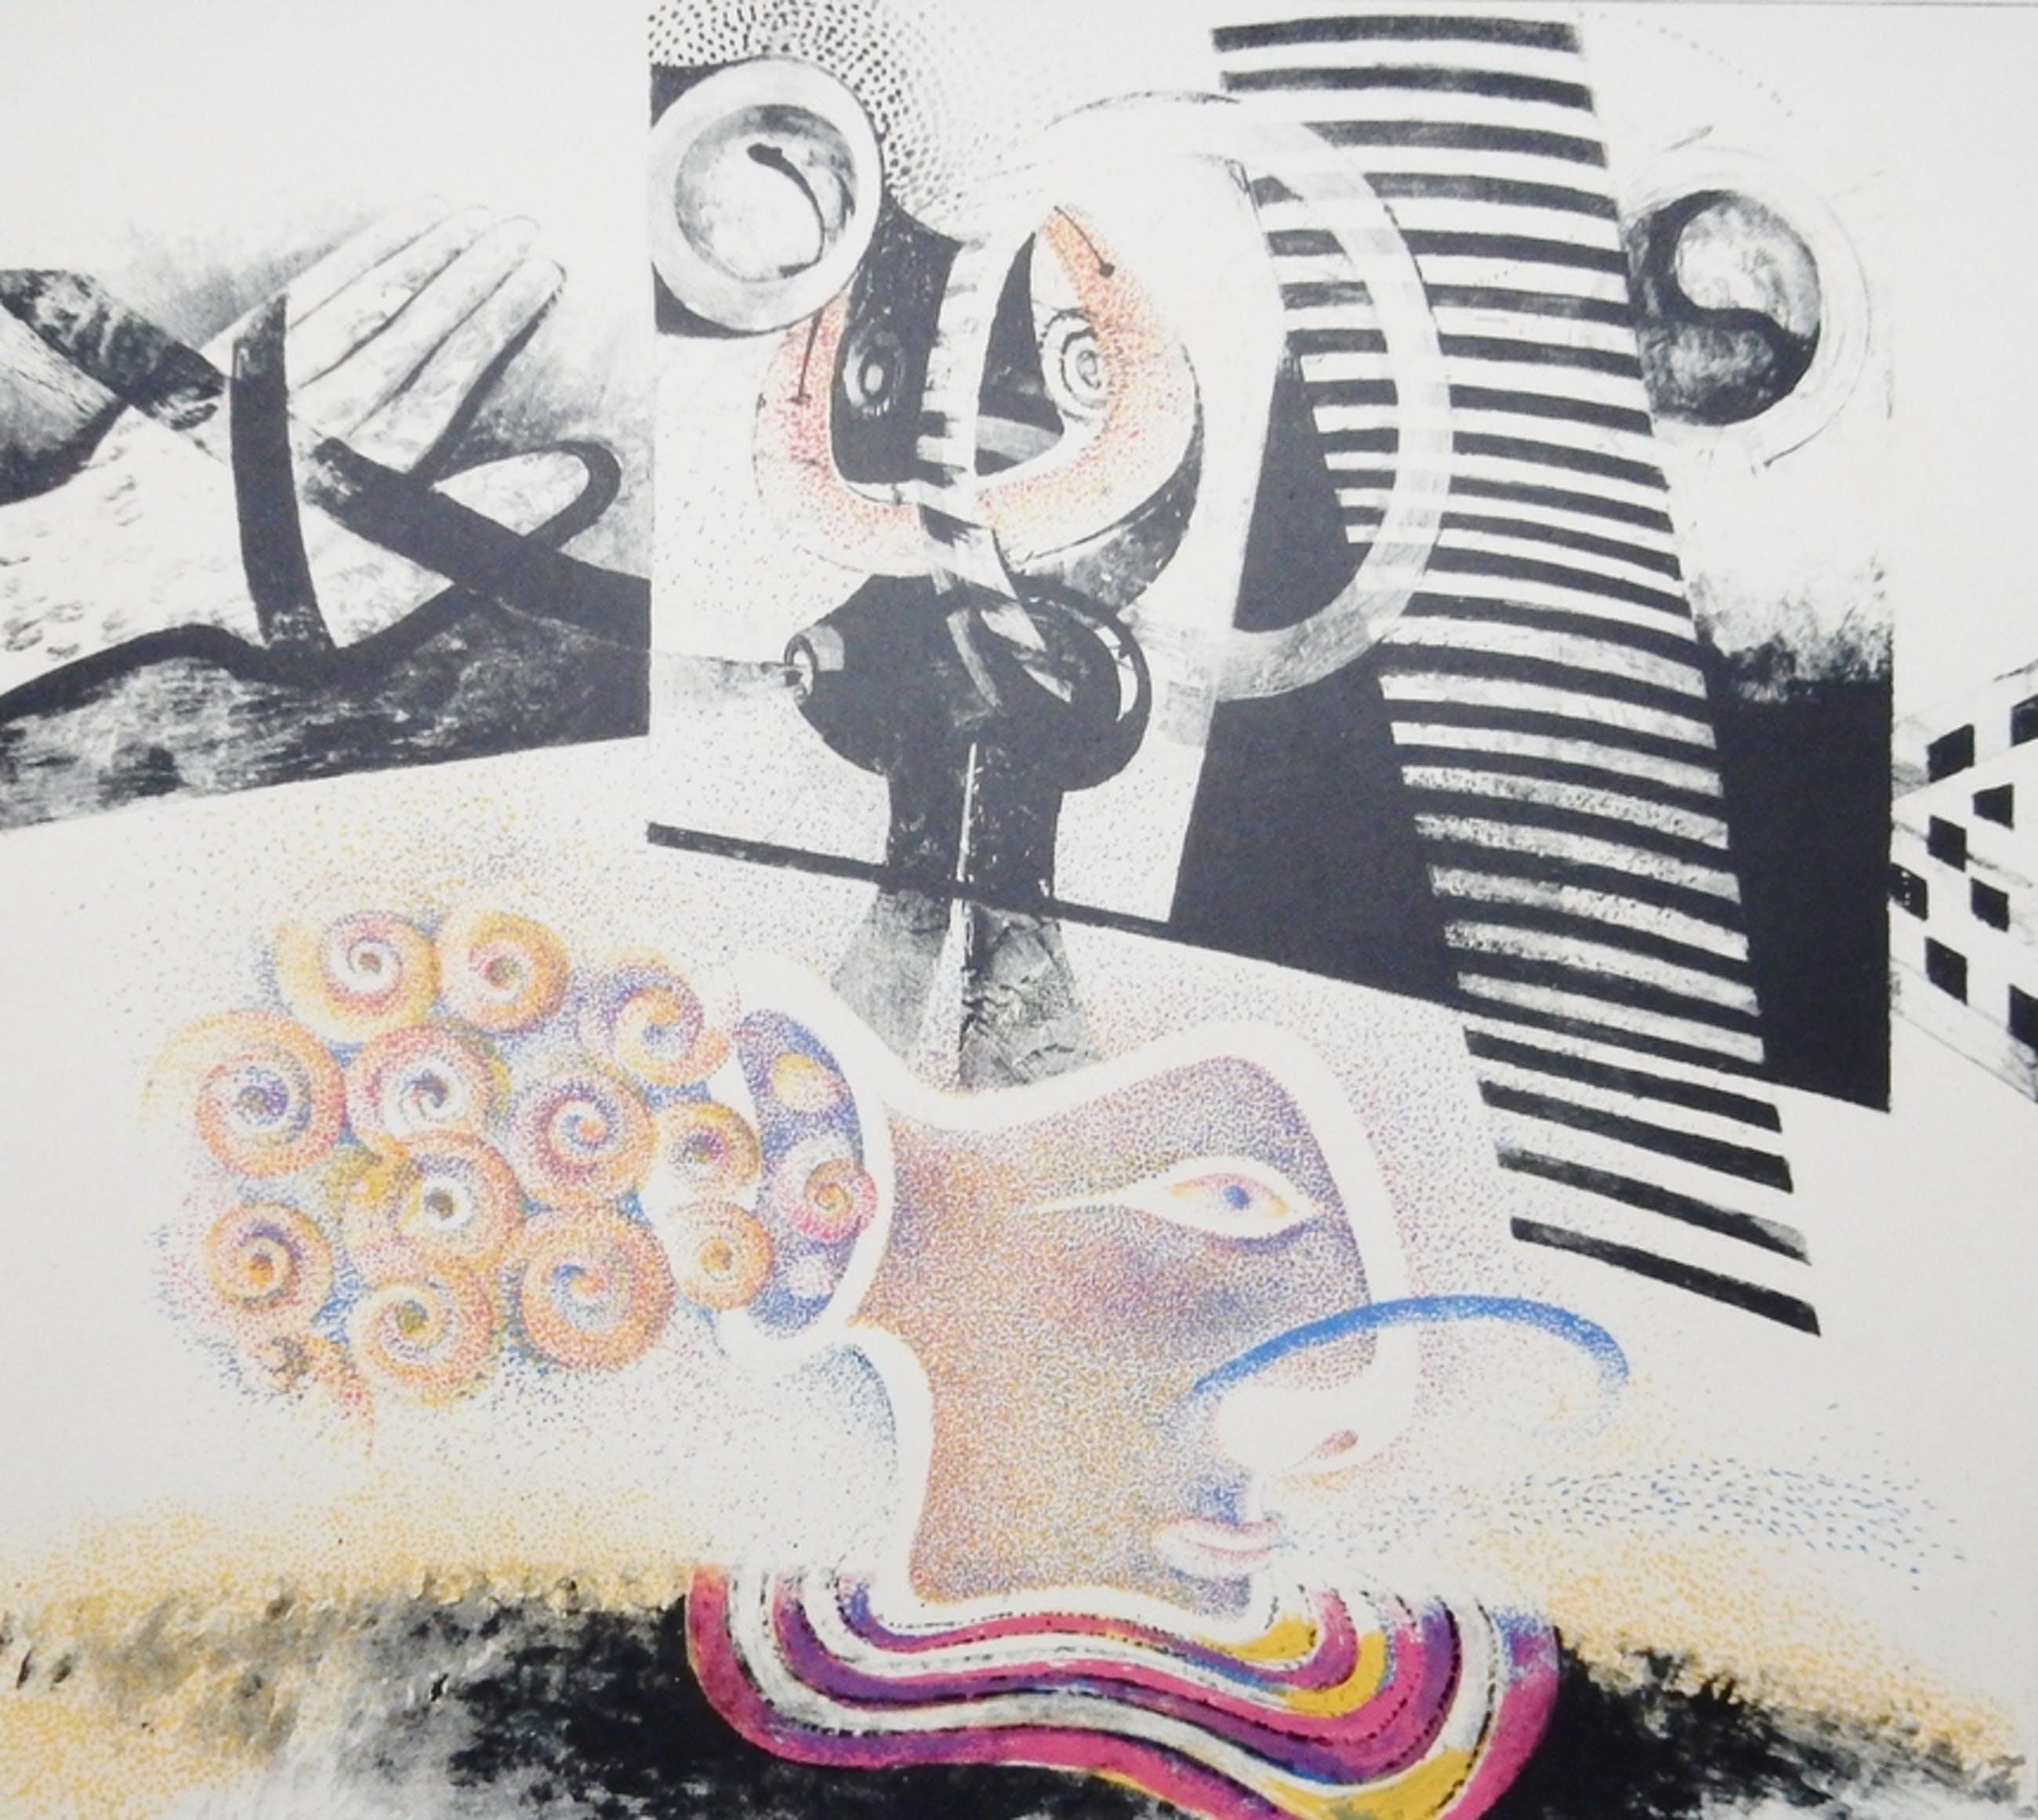 Martin Engelman (1924-1992) - Litho - 1967 kopen? Bied vanaf 35!